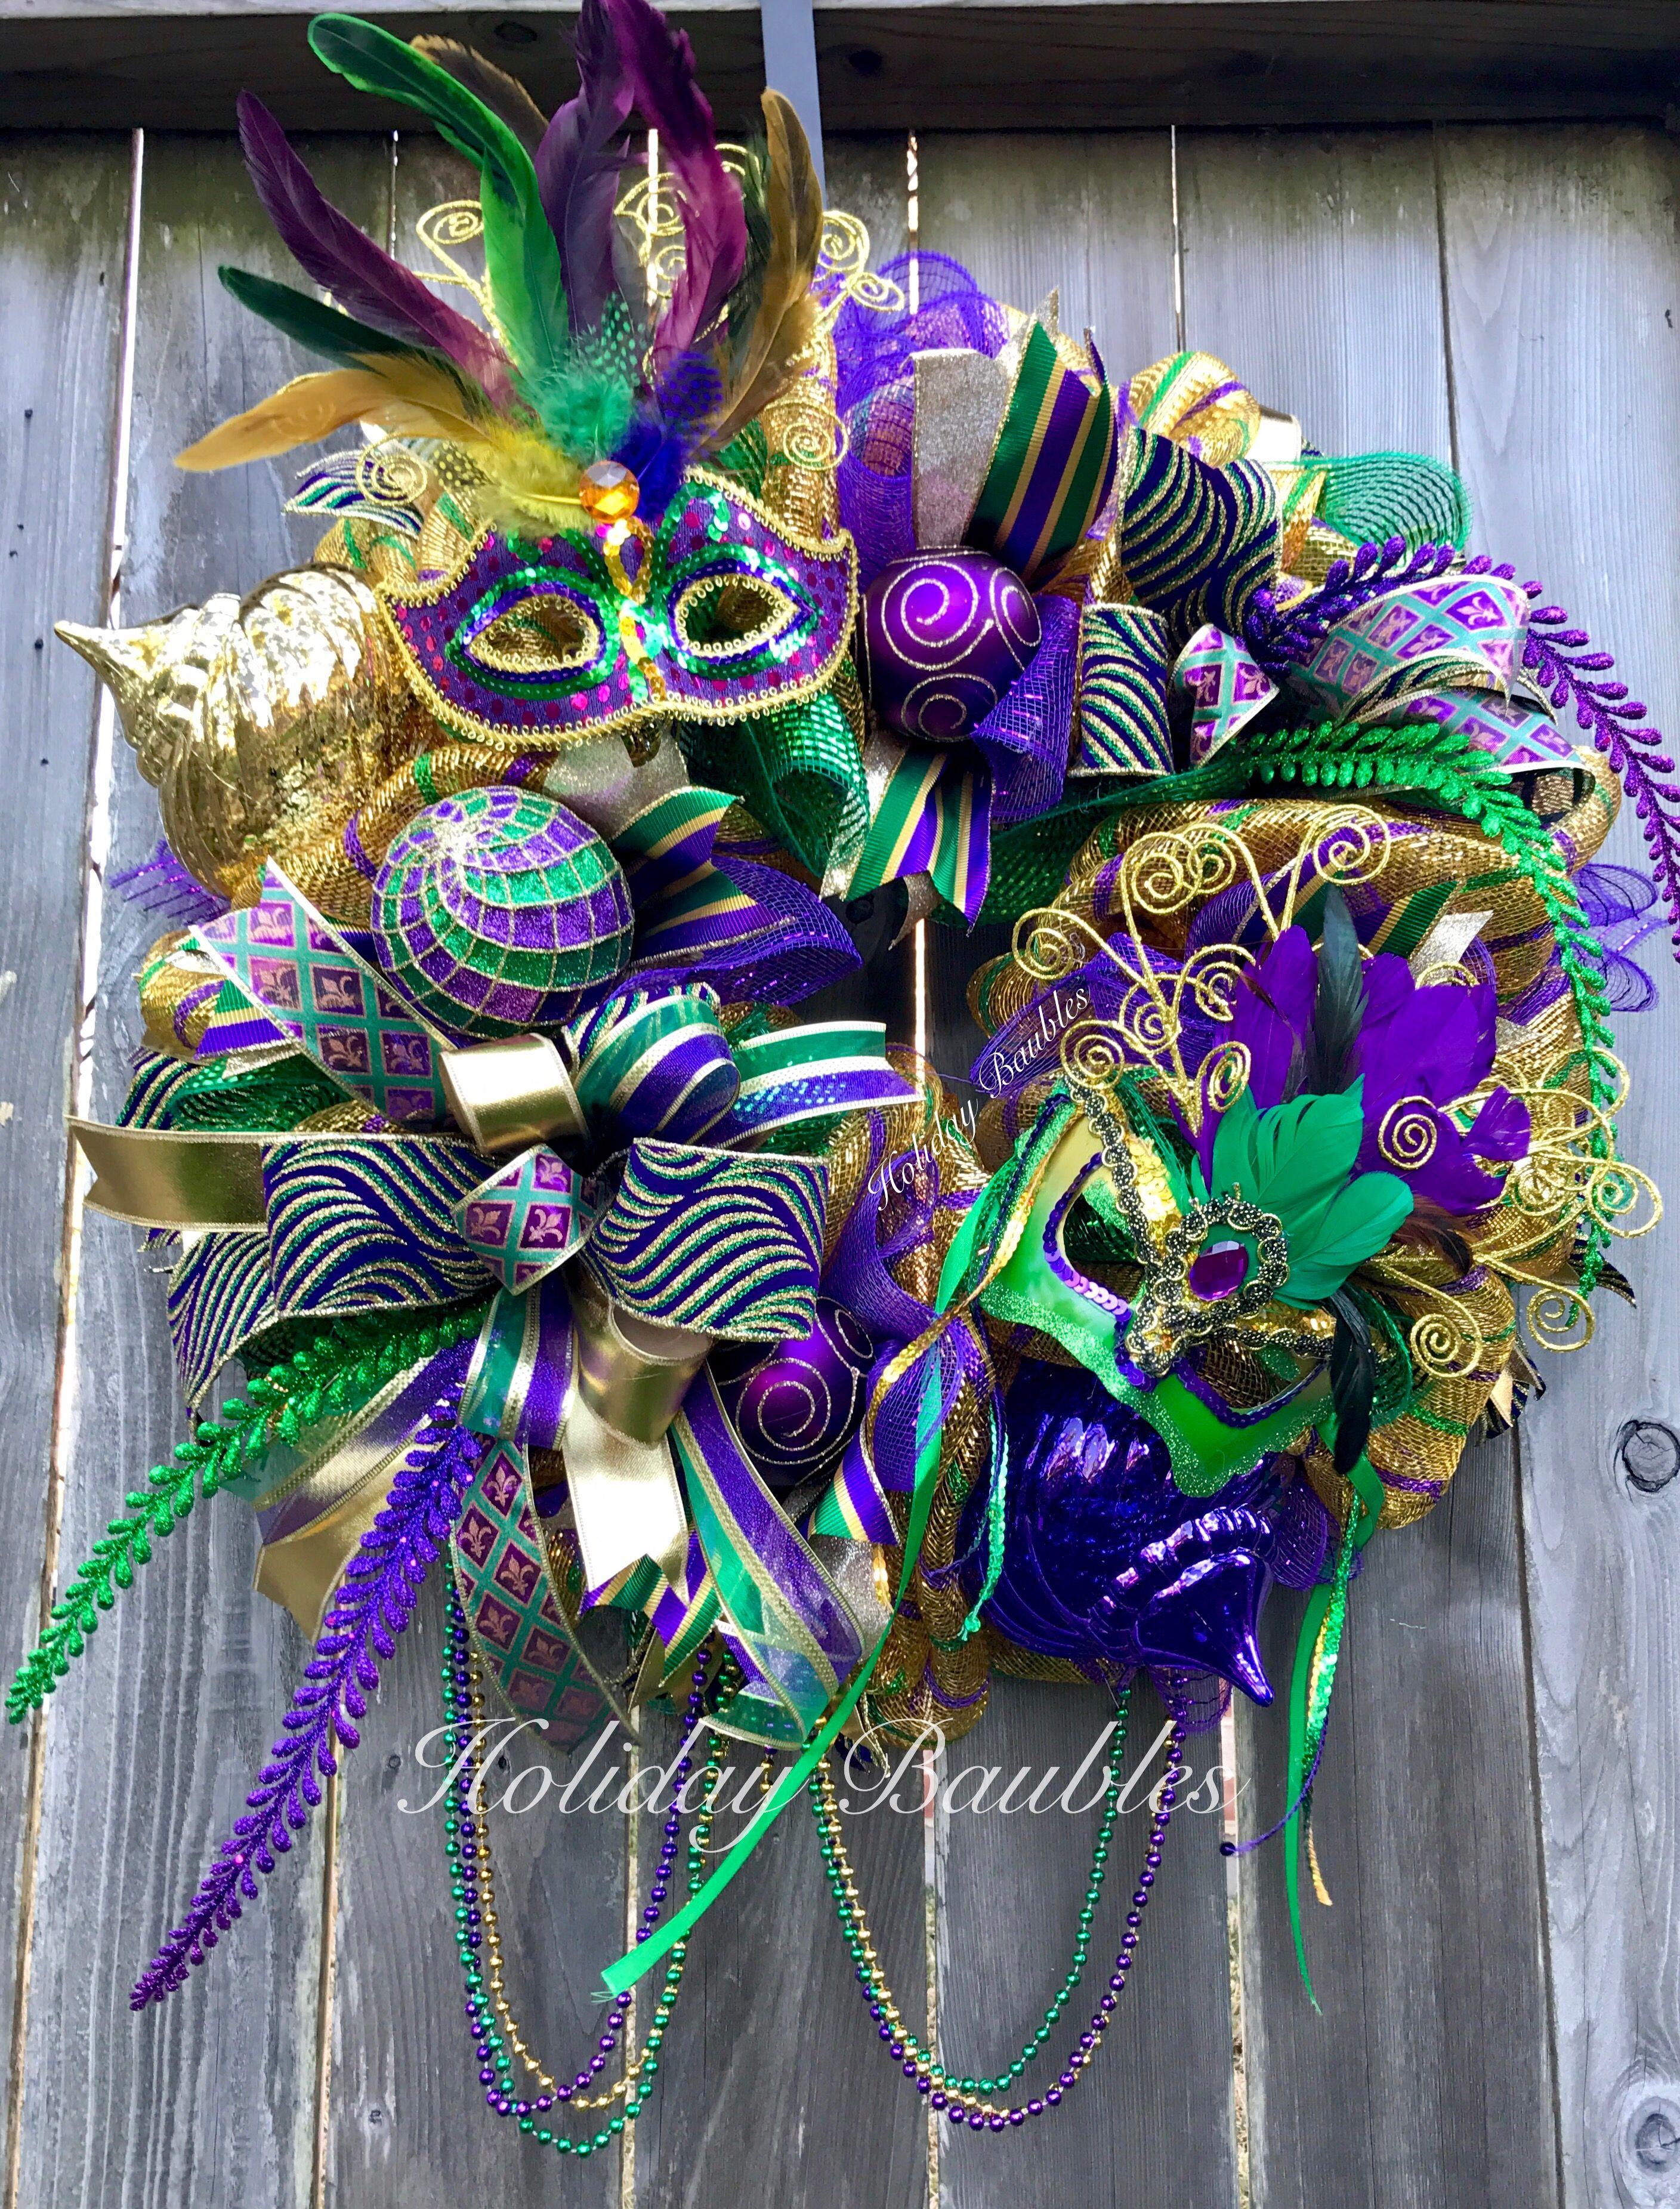 Mardi Gras By Holiday Baubles Mardi Gras Wreath Mardi Gras Decorations Mardi Gras